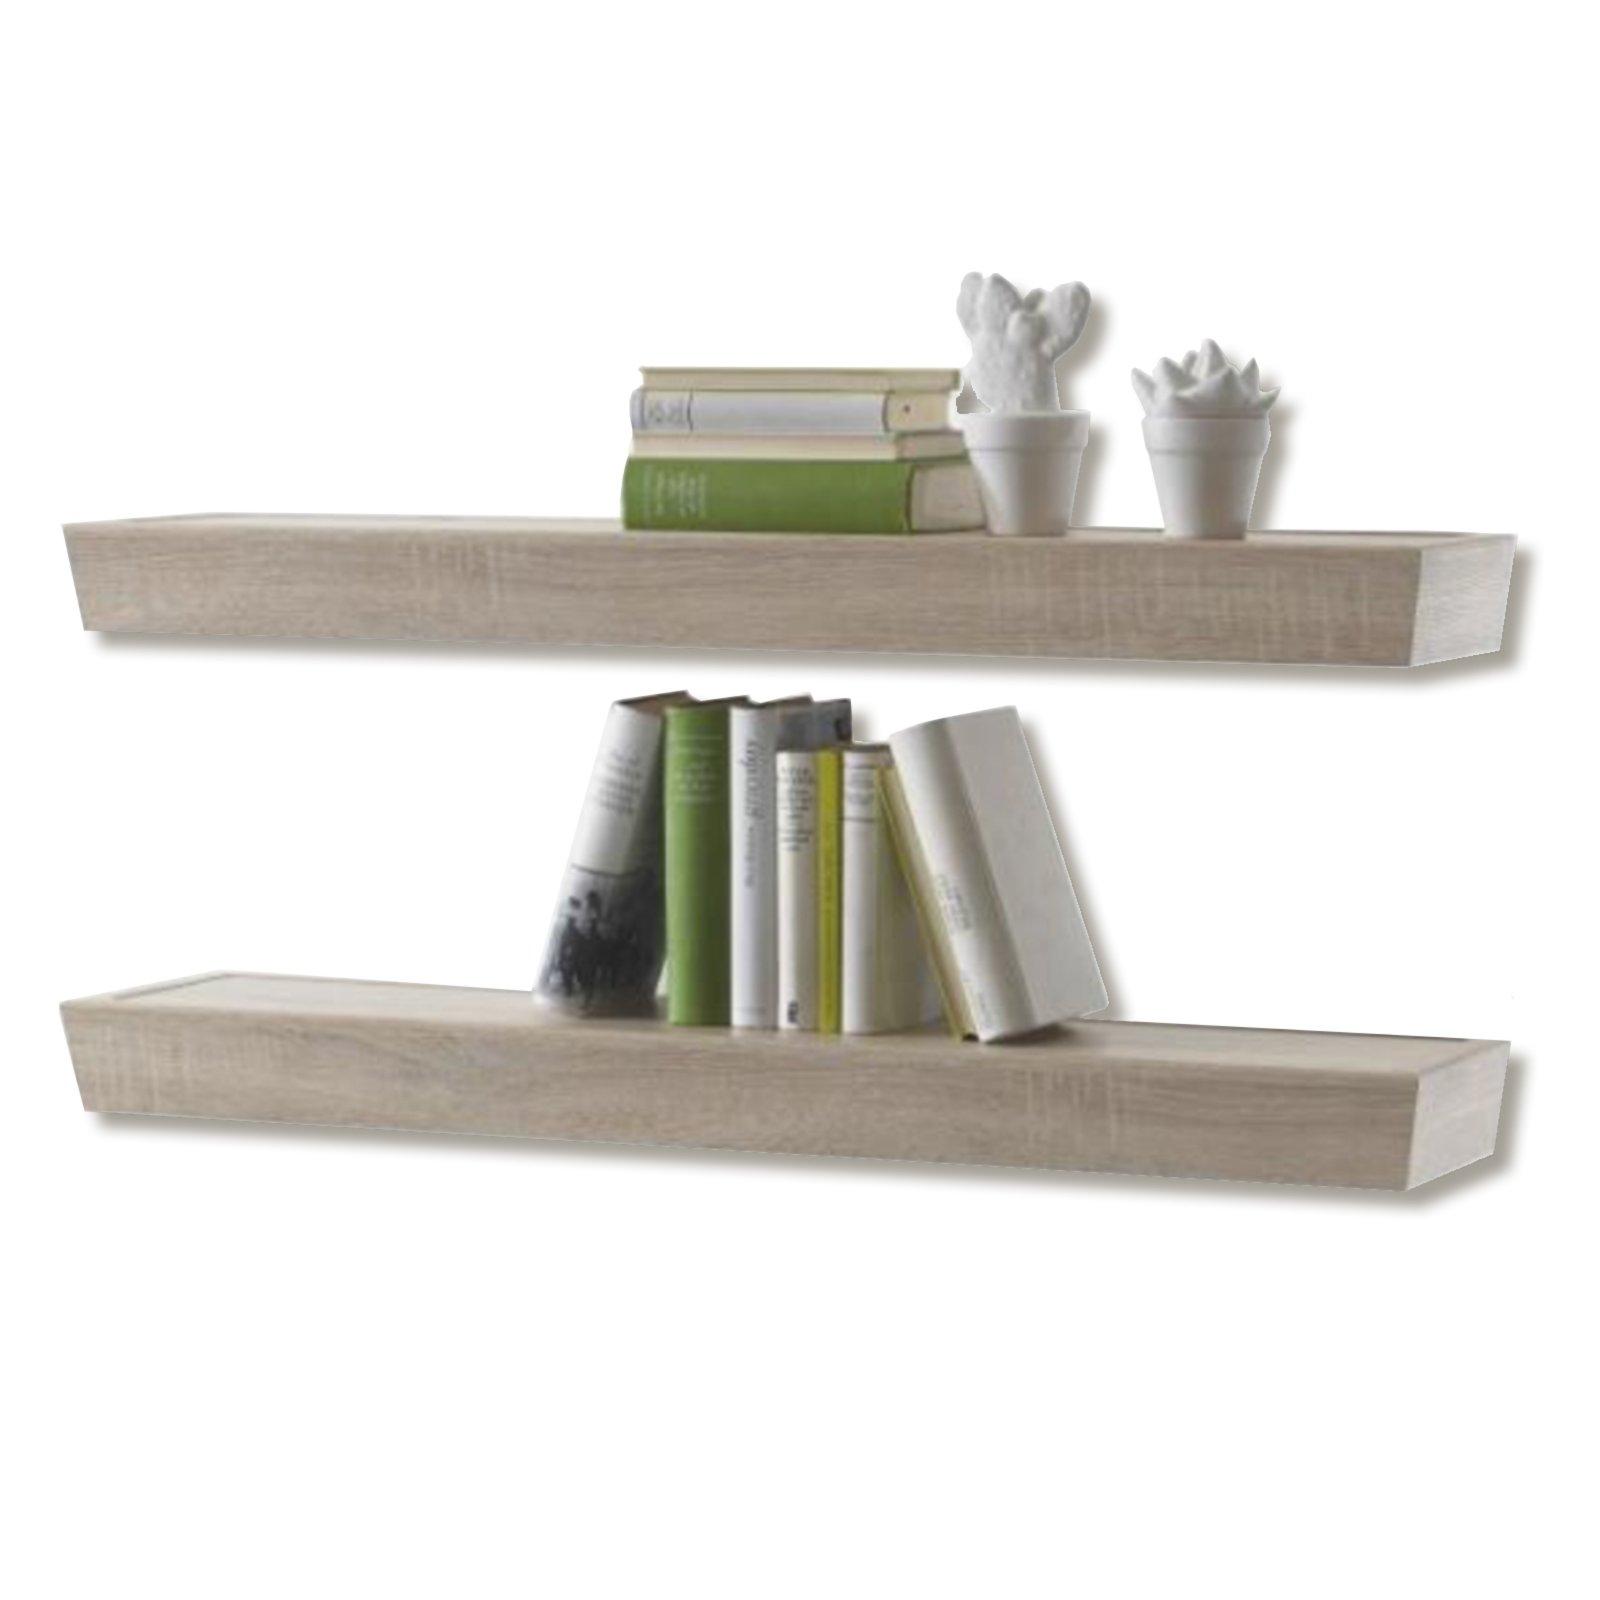 2er set wandboard fernando sonoma eiche 100 cm wohnwand fernando wohnwand elemente. Black Bedroom Furniture Sets. Home Design Ideas